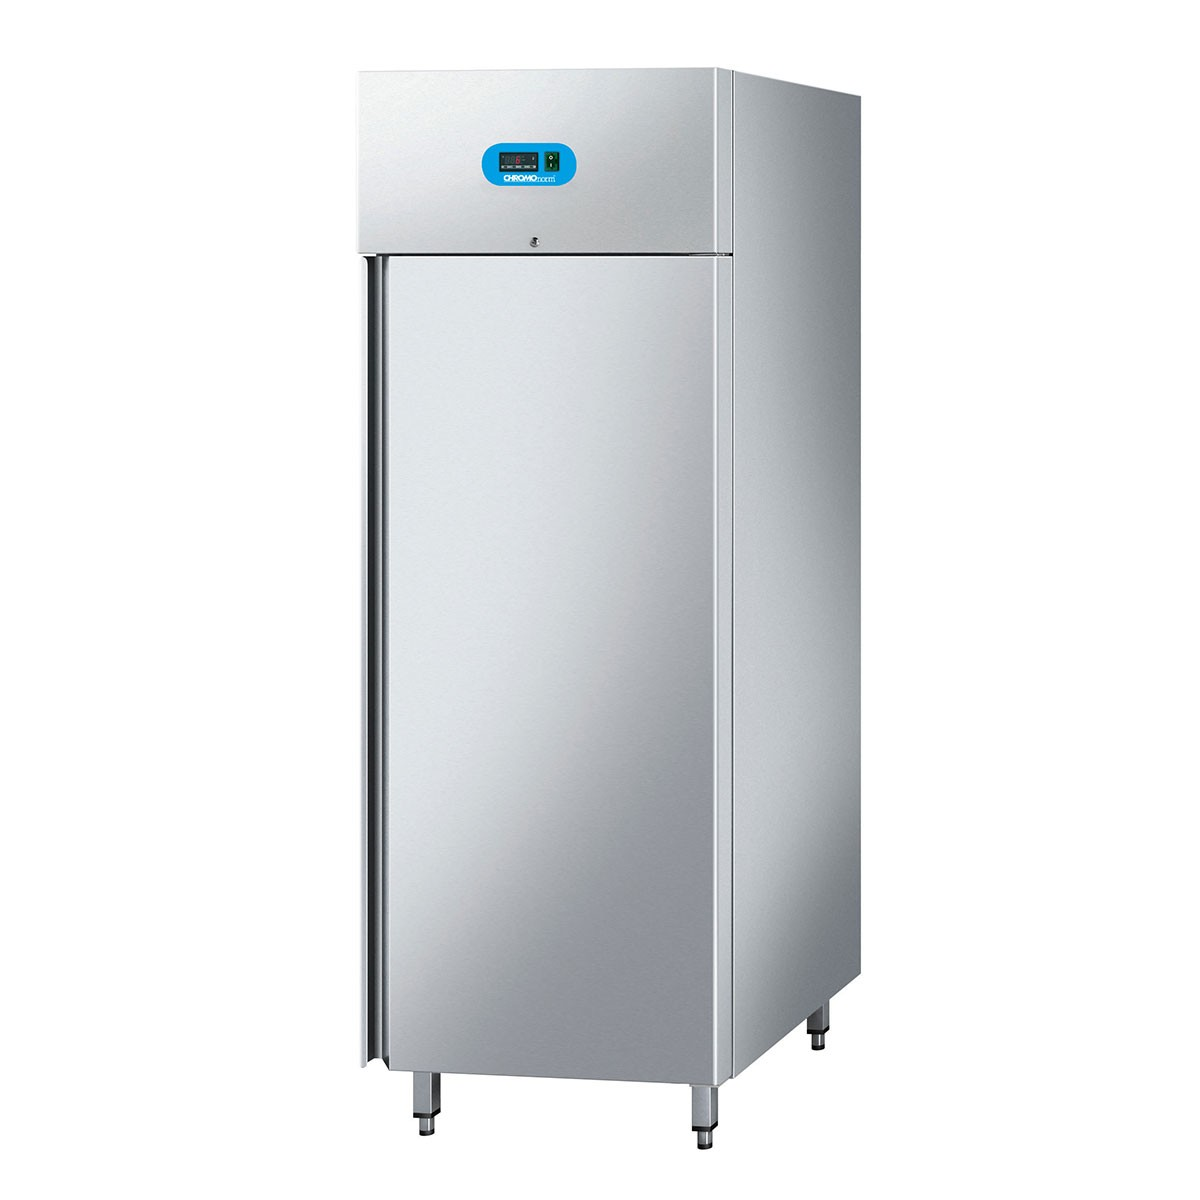 Chromonorm Gastro Tiefkühlschrank Nova 695 x 810mm CHKMT0700001